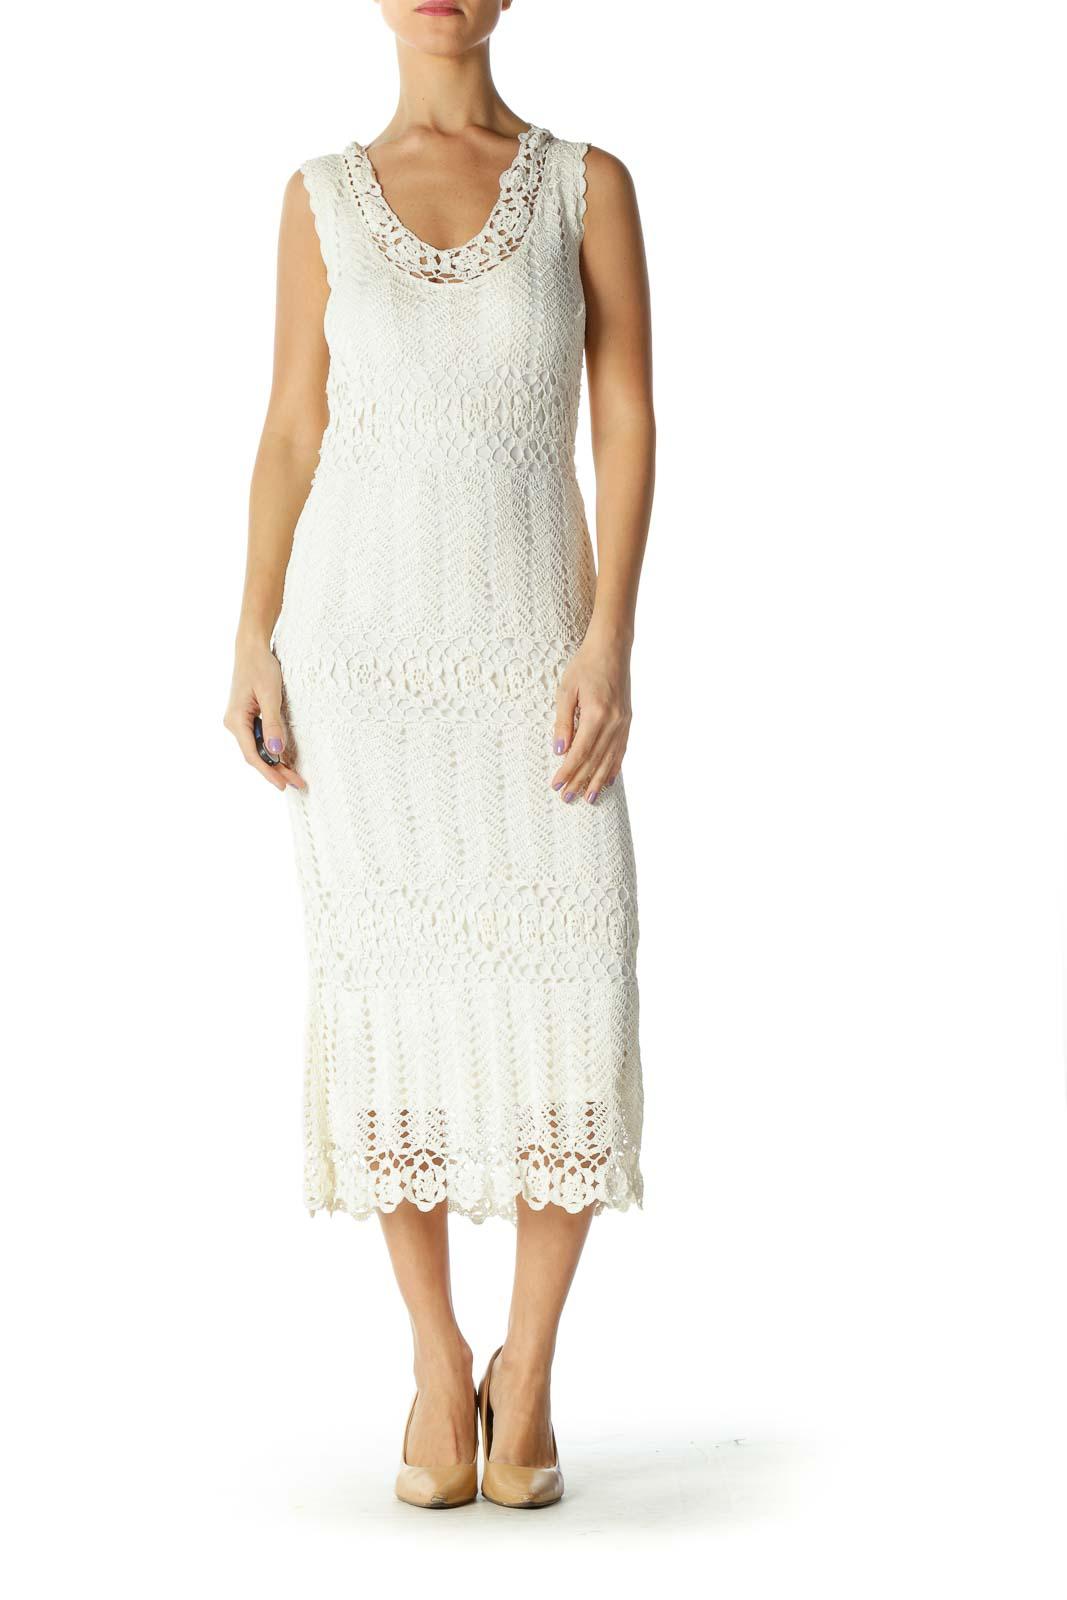 Cream Knit Retro Dress Front